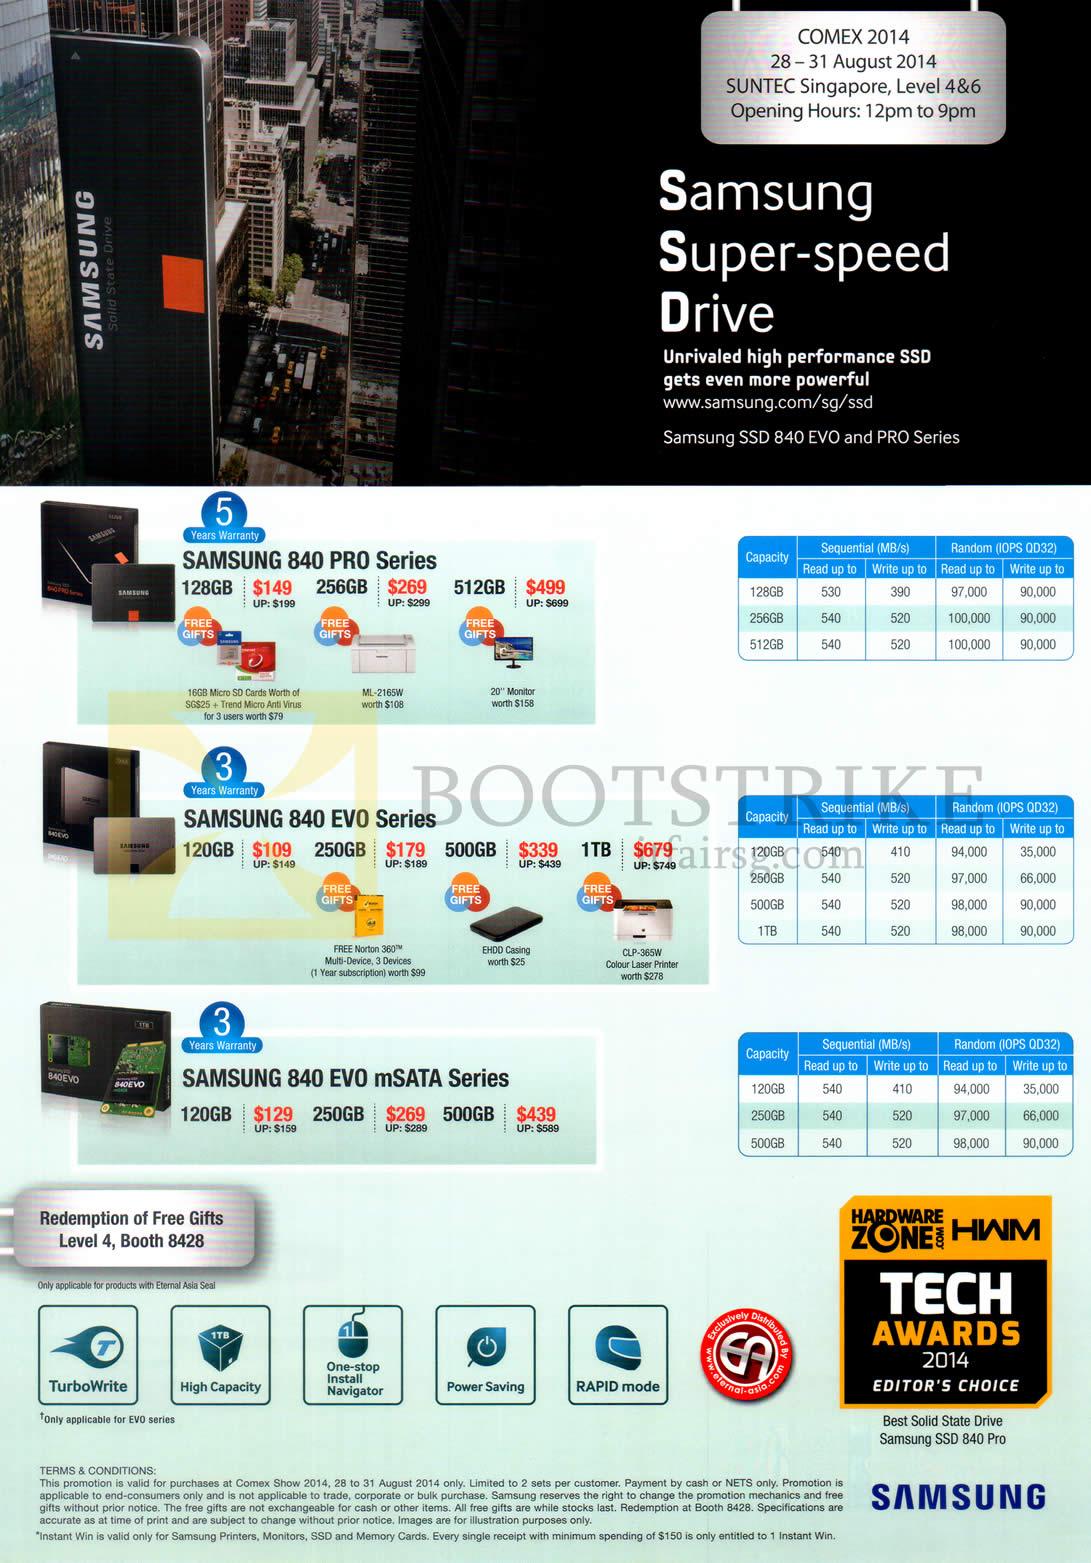 COMEX 2014 price list image brochure of Samsung Storage 840 Pro Series, Evo Series, 840 Evo MSata Series 128GB 256GB 512GB 120GB 250GB 500GB 1TB